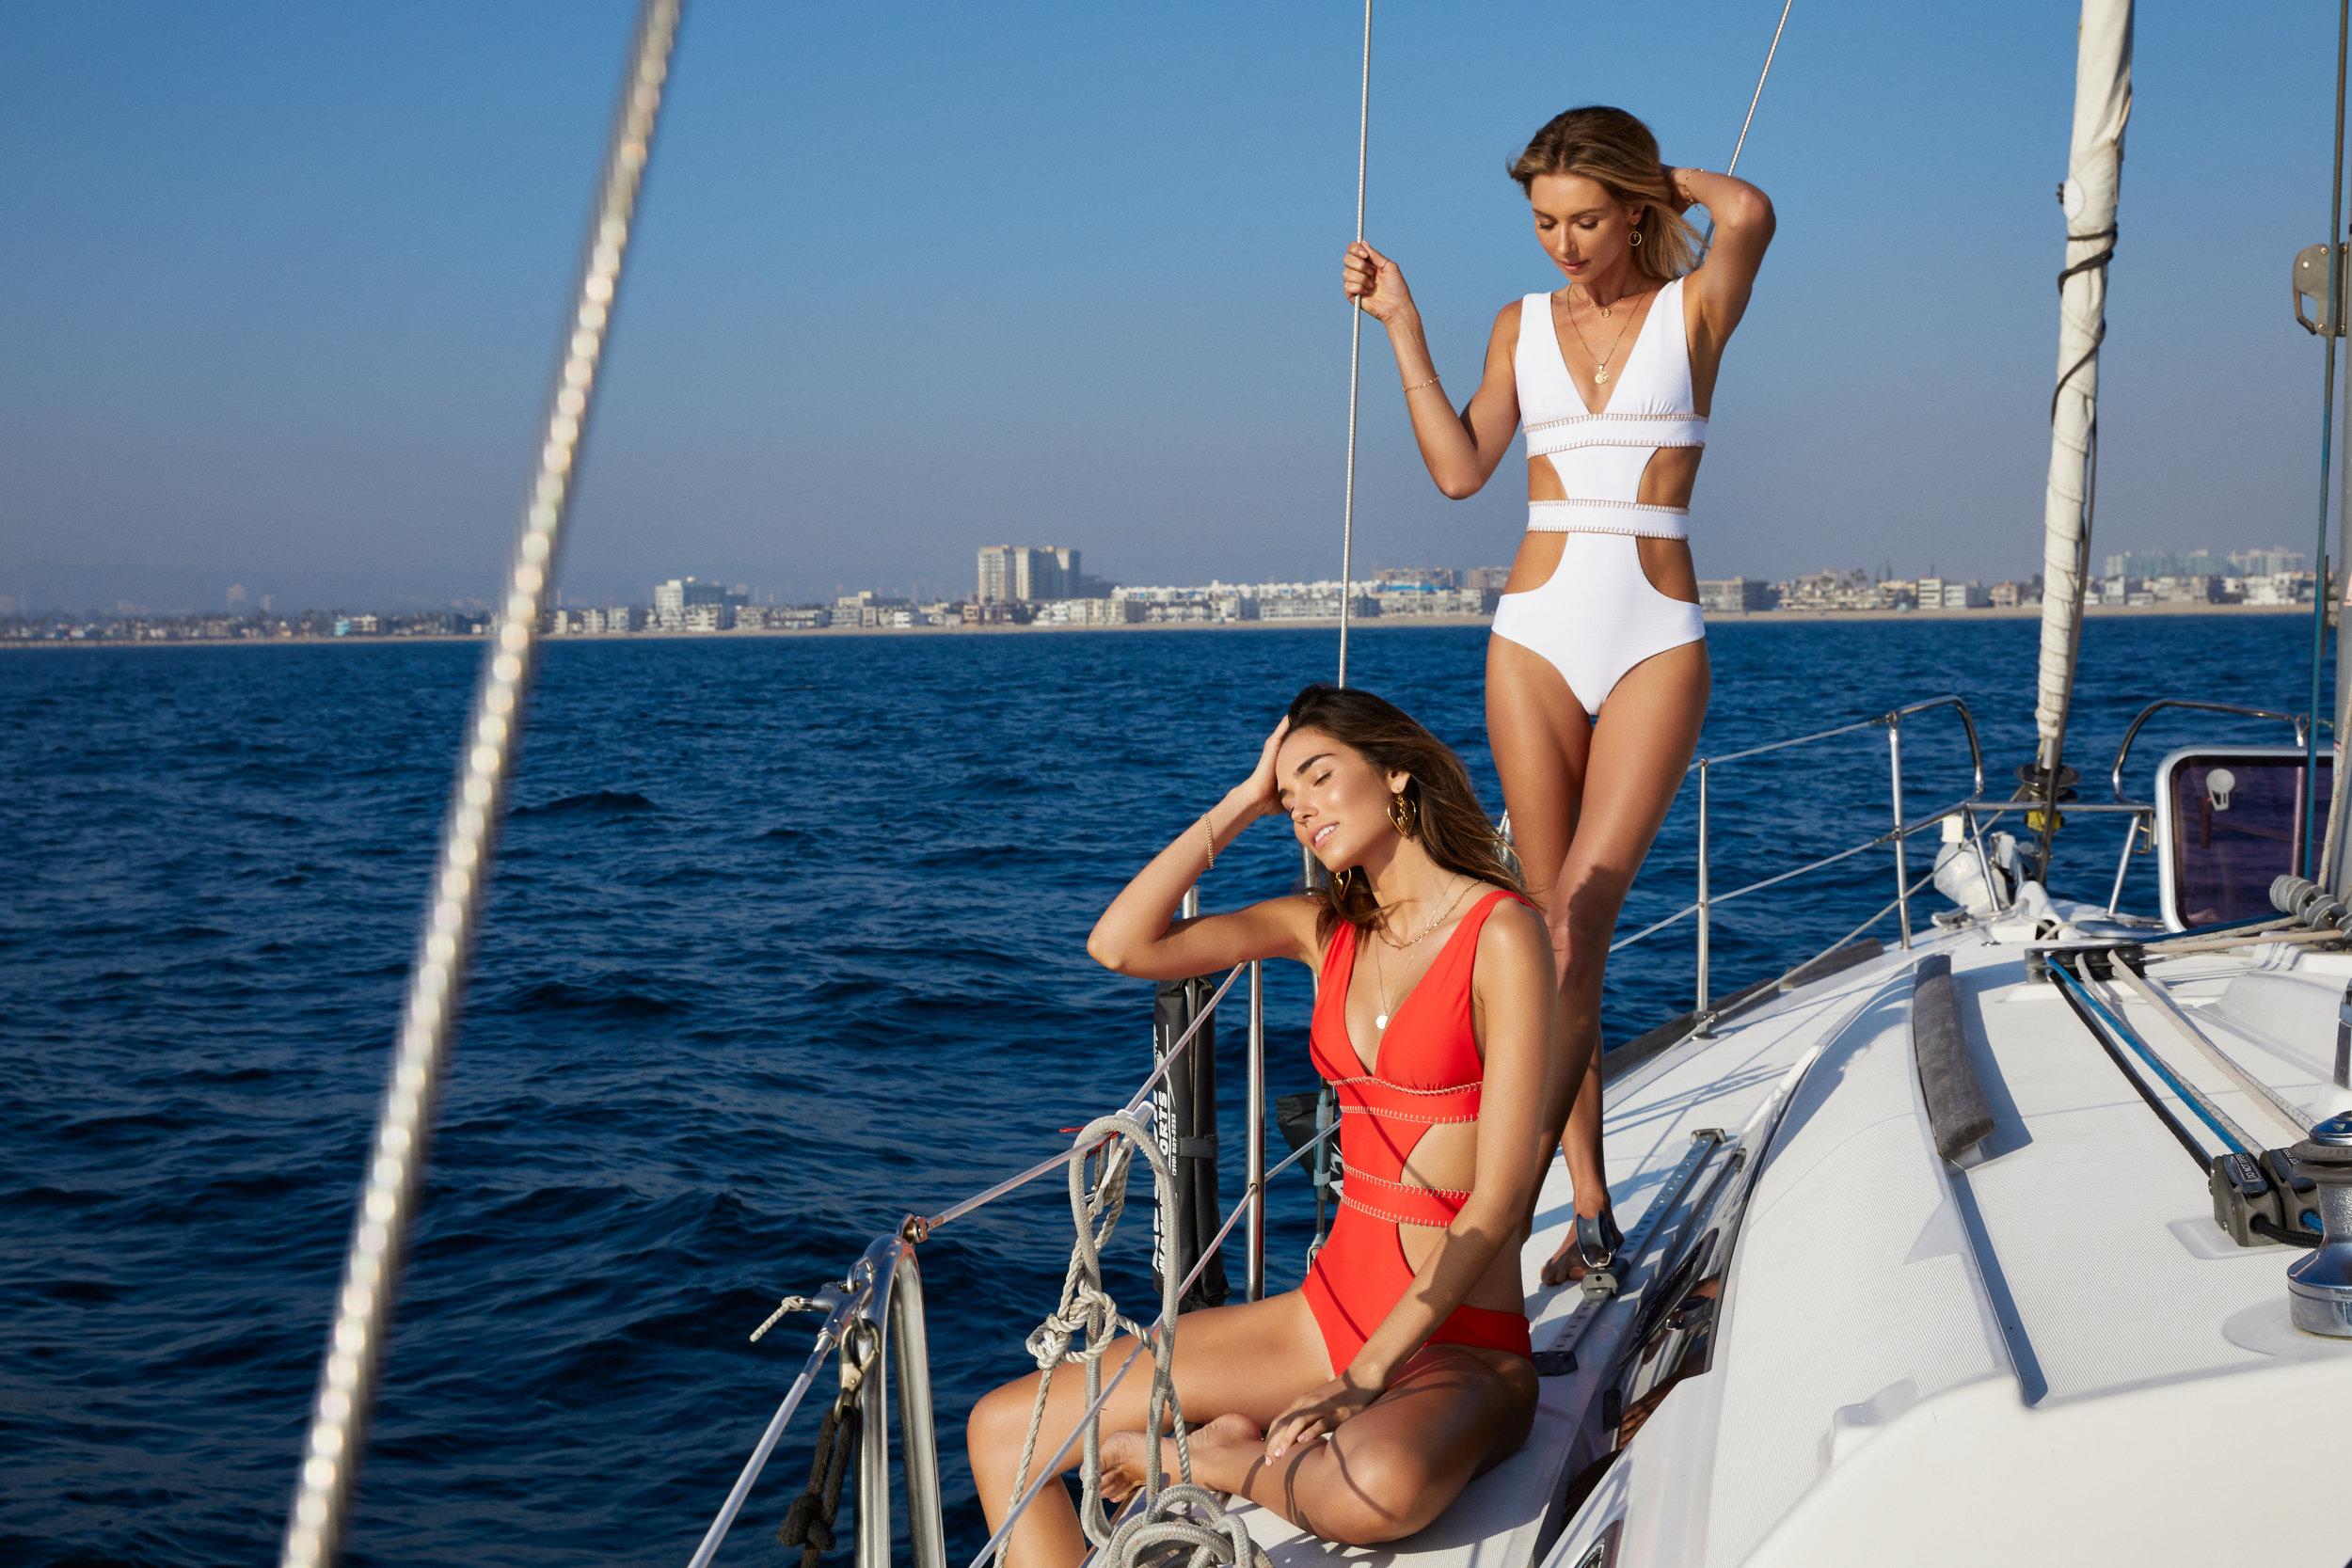 ElleJay - Swim | Resortwearwww.shopellejay.com